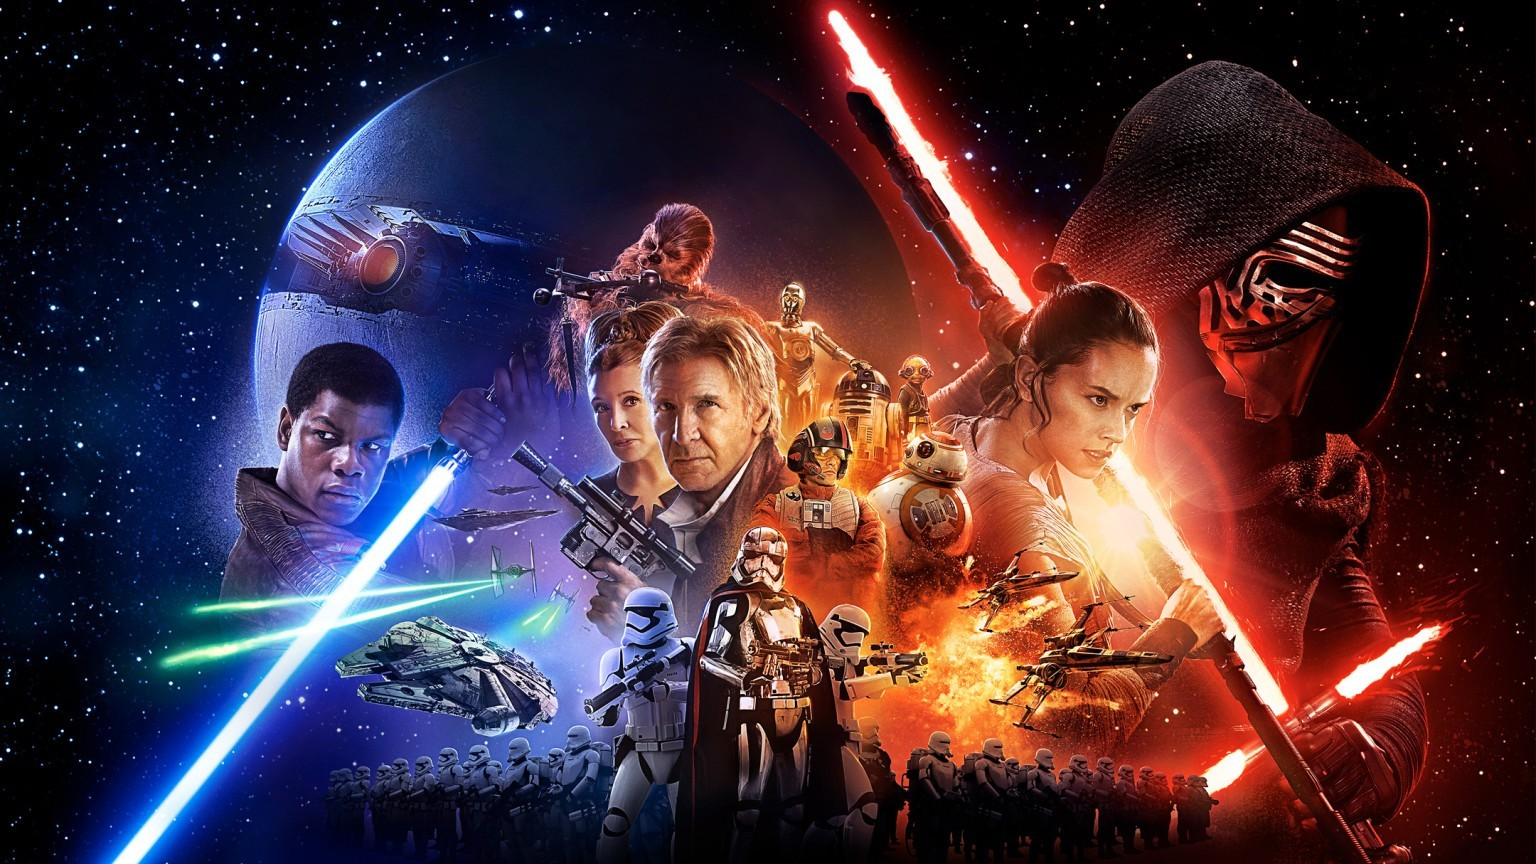 Desktop Wallpaper Star Wars 1536x864 Download Hd Wallpaper Wallpapertip